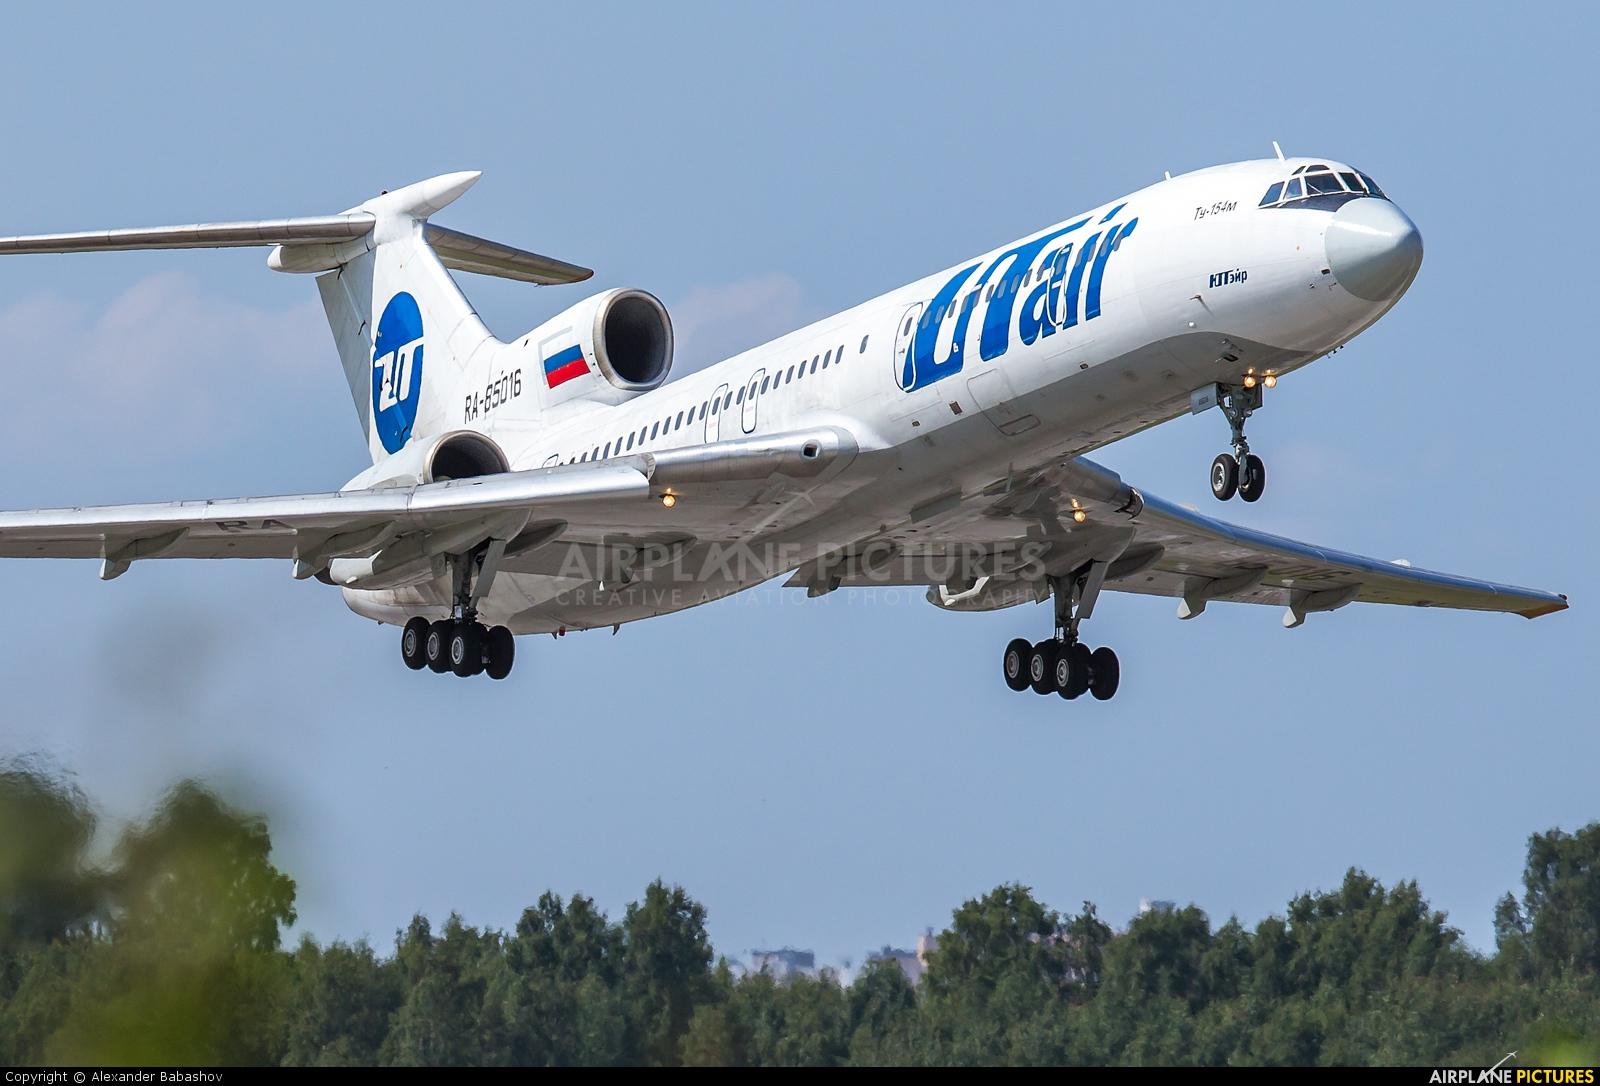 UTair Tupolev Tu-154M RA-85016